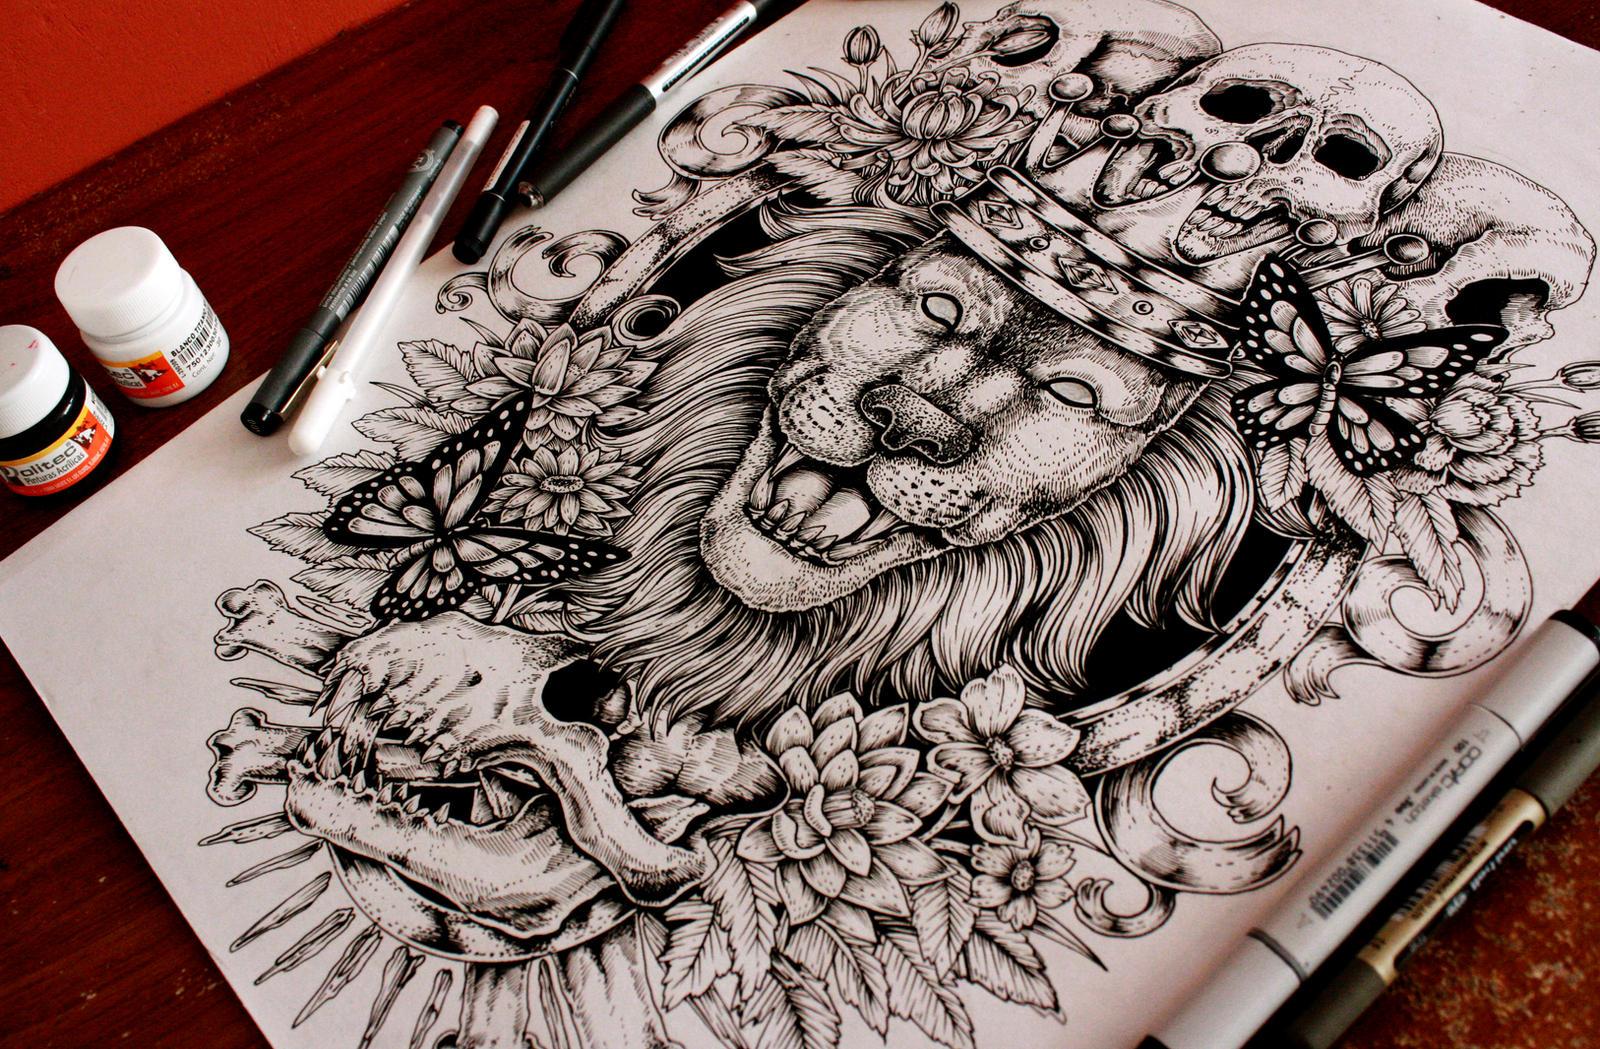 Lion Back Tattoo By EG TheFreak On DeviantArt